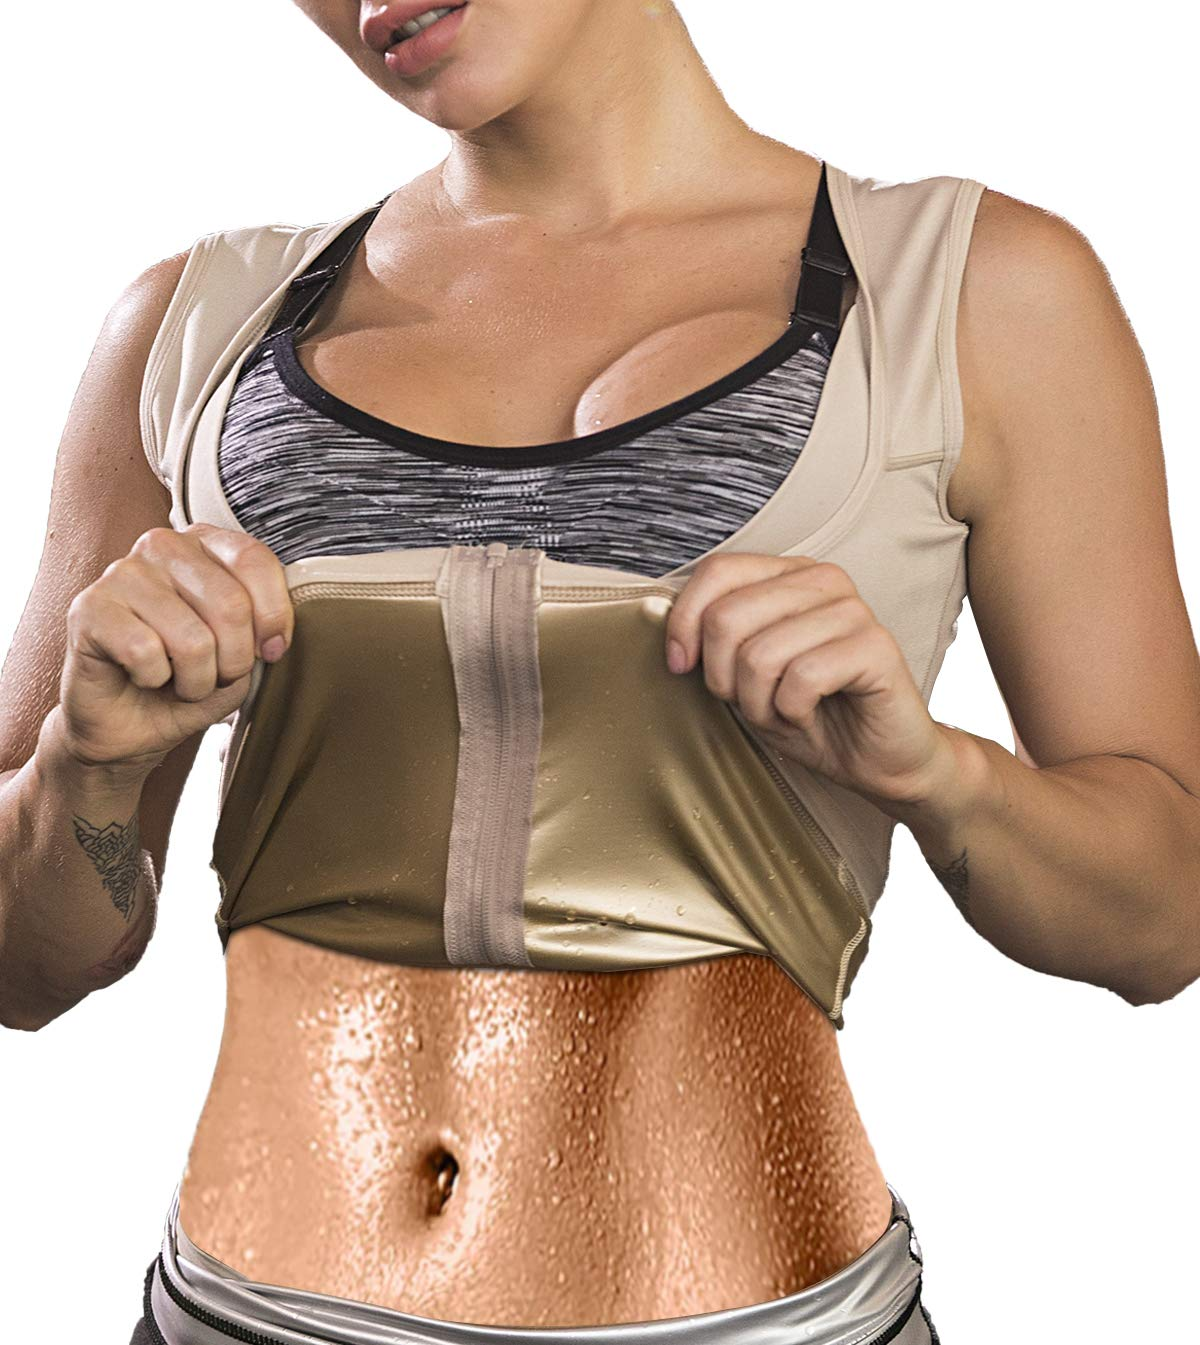 SAYFUT Women Sauna Sweat Vest Polymer Slimming Workout Sauna Tank Top Shapewear for Weight Loss